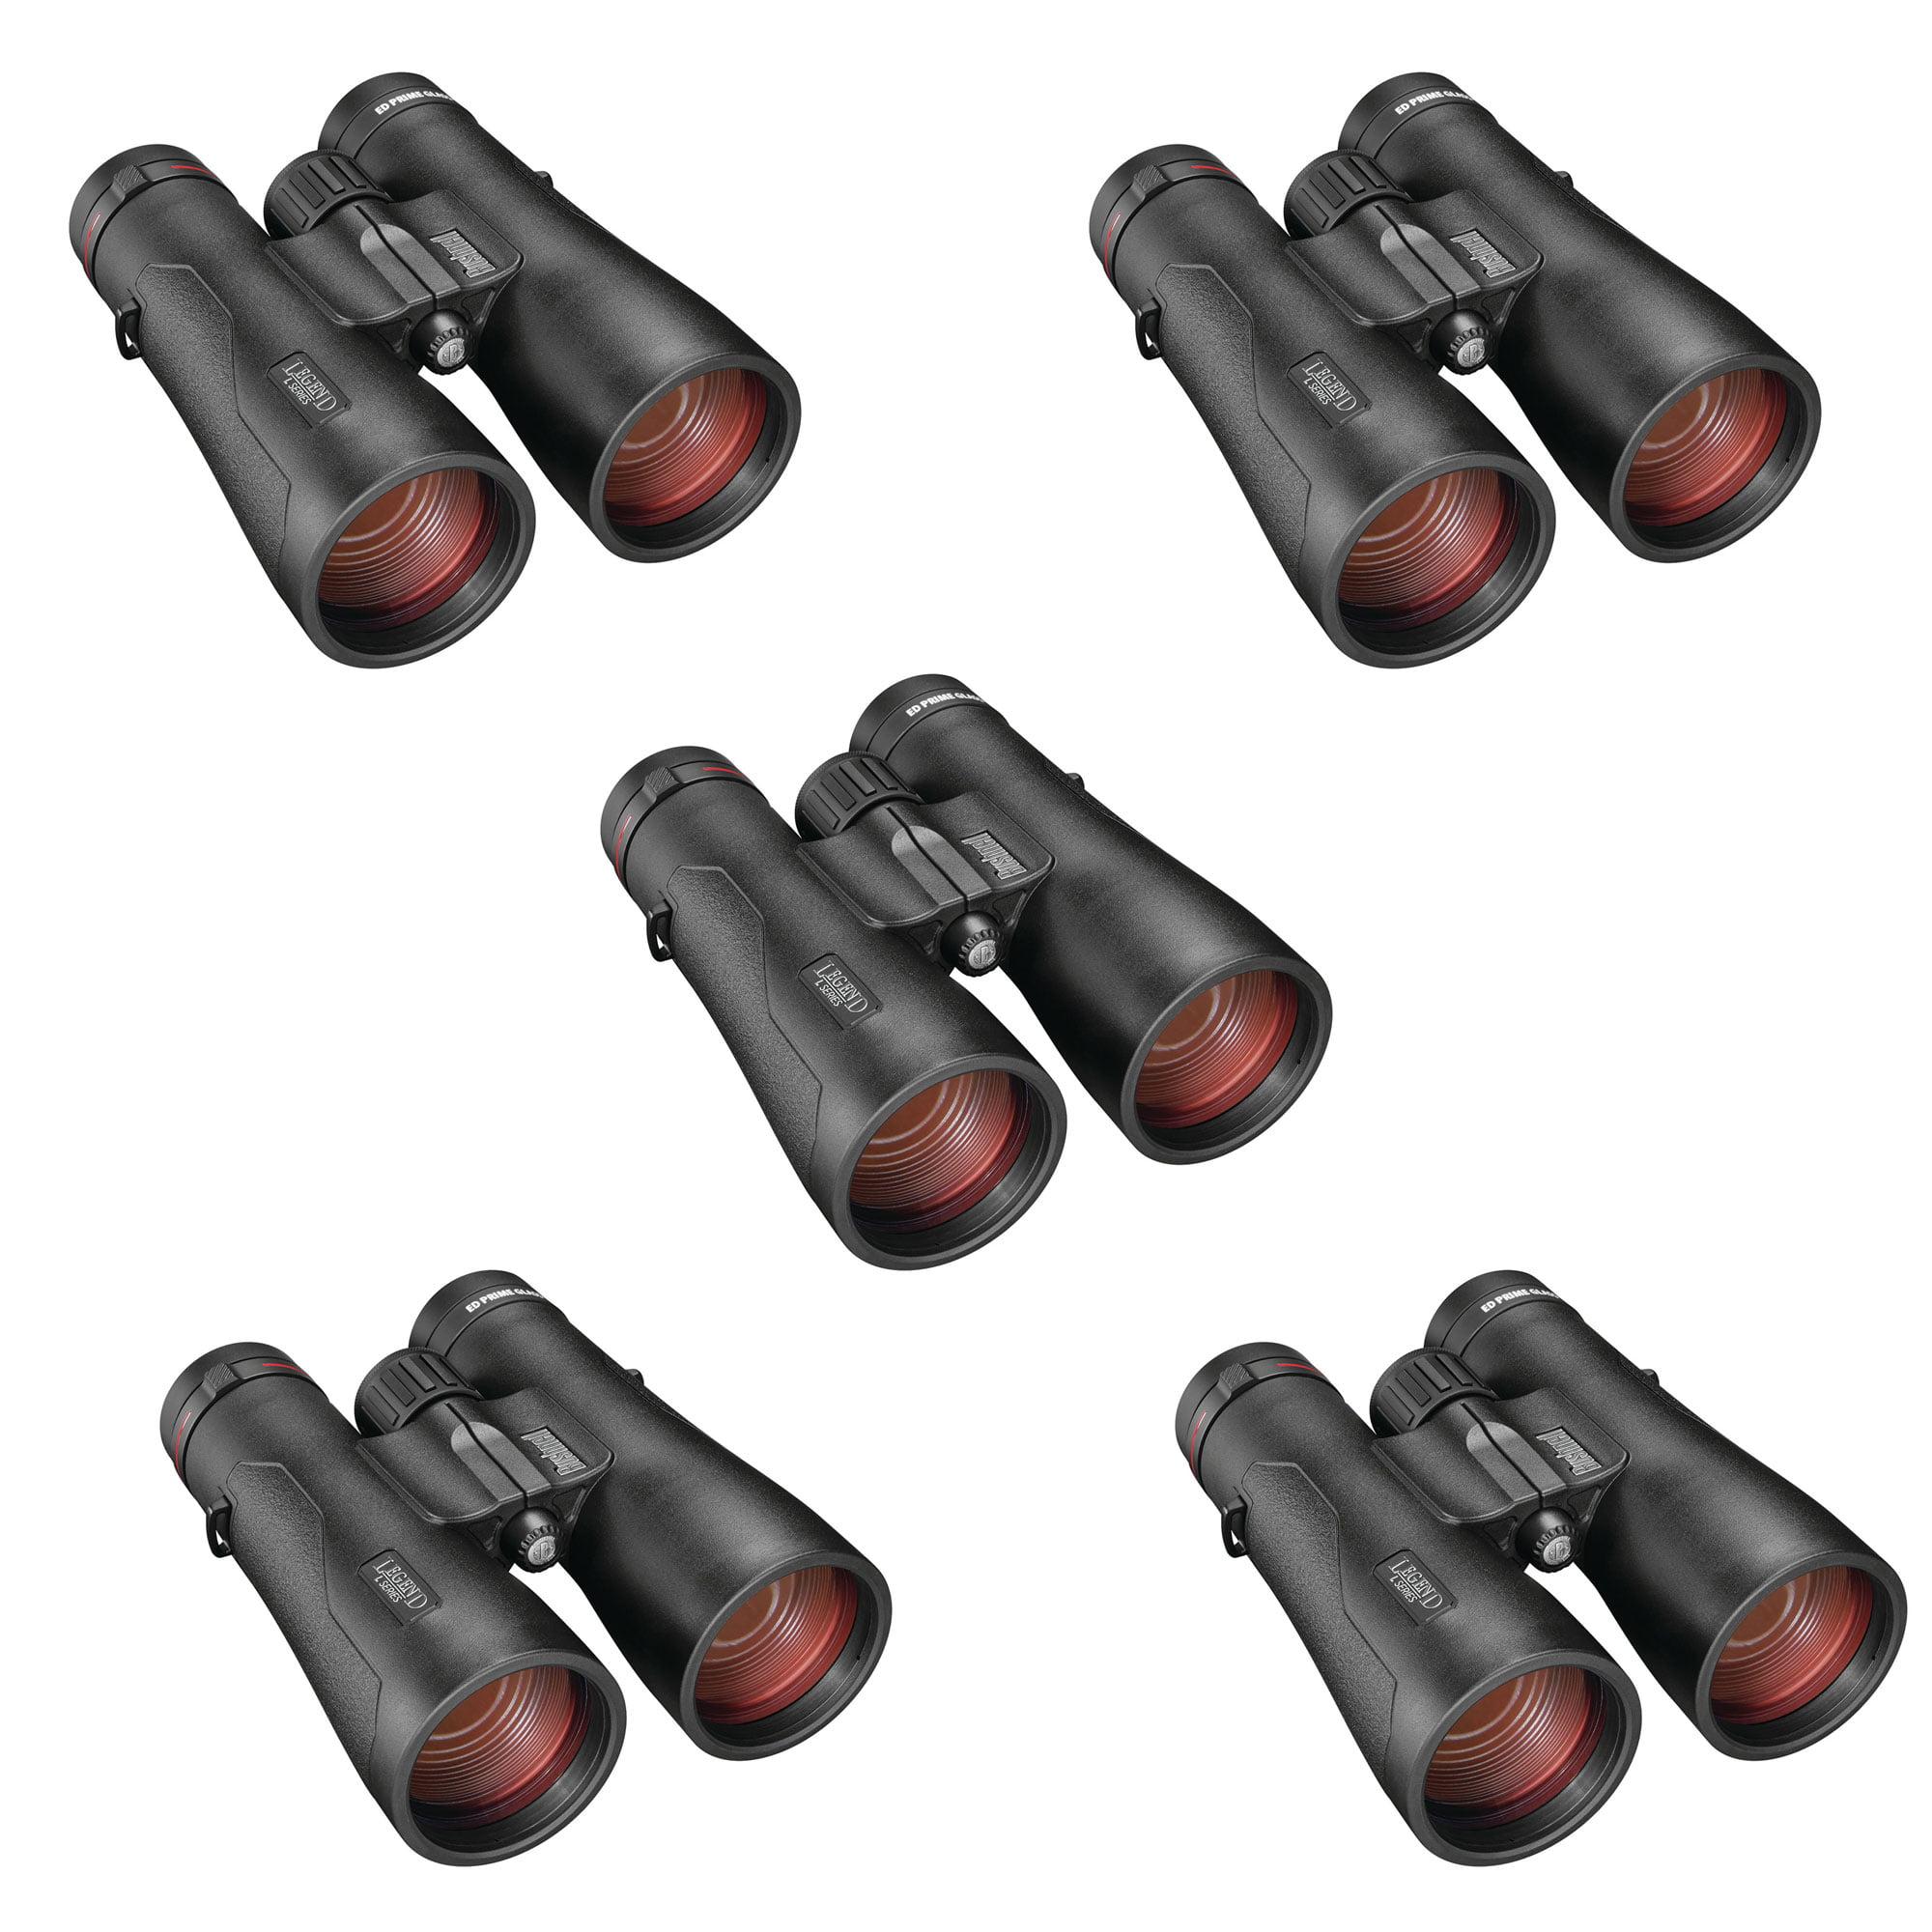 Bushnell Legend L Series 12x 50mm Waterproof Hunting Binoculars, Black (5 Pack)